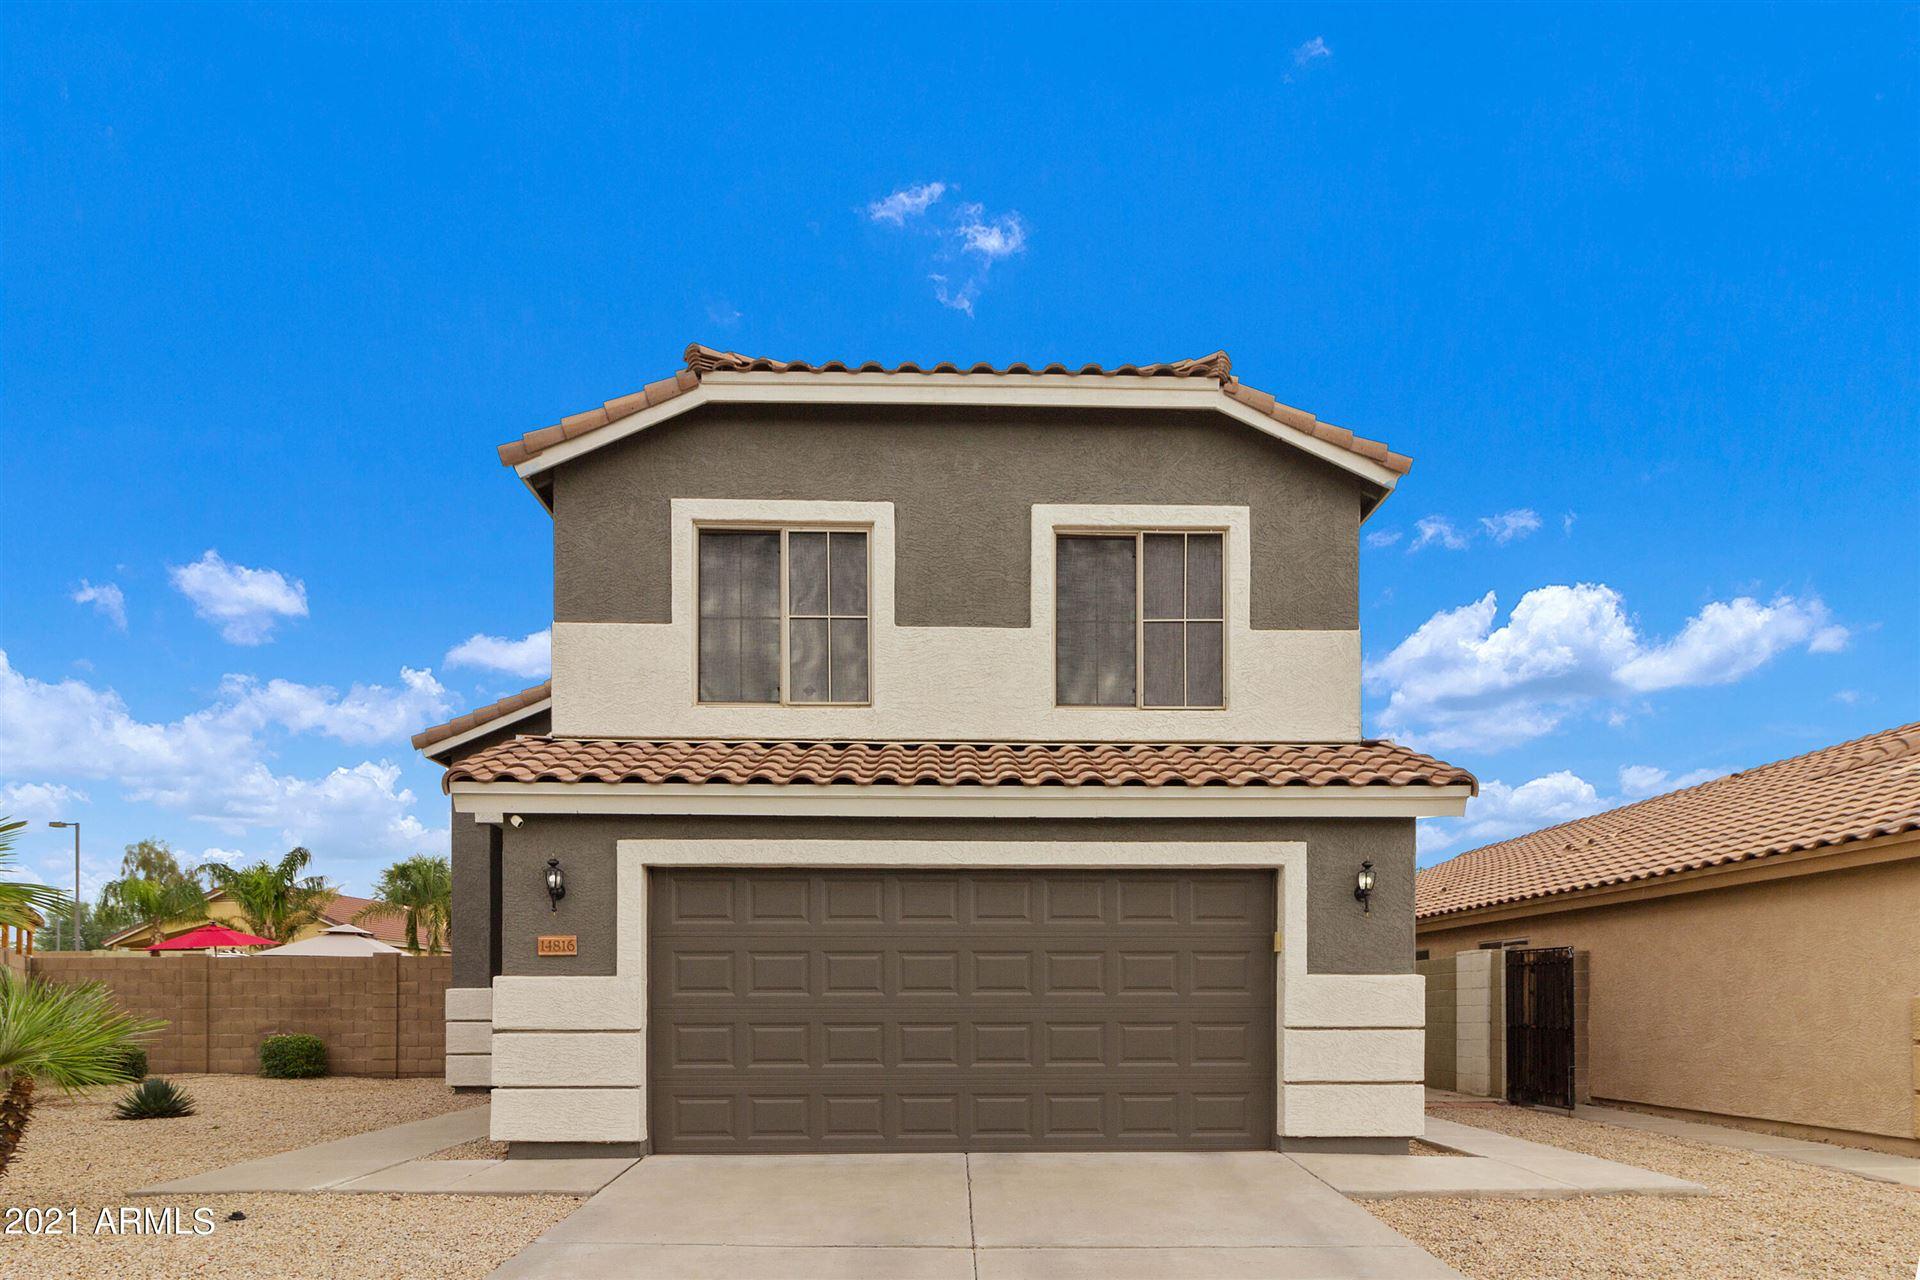 14816 W ELY Drive, Surprise, AZ 85374 - MLS#: 6289334